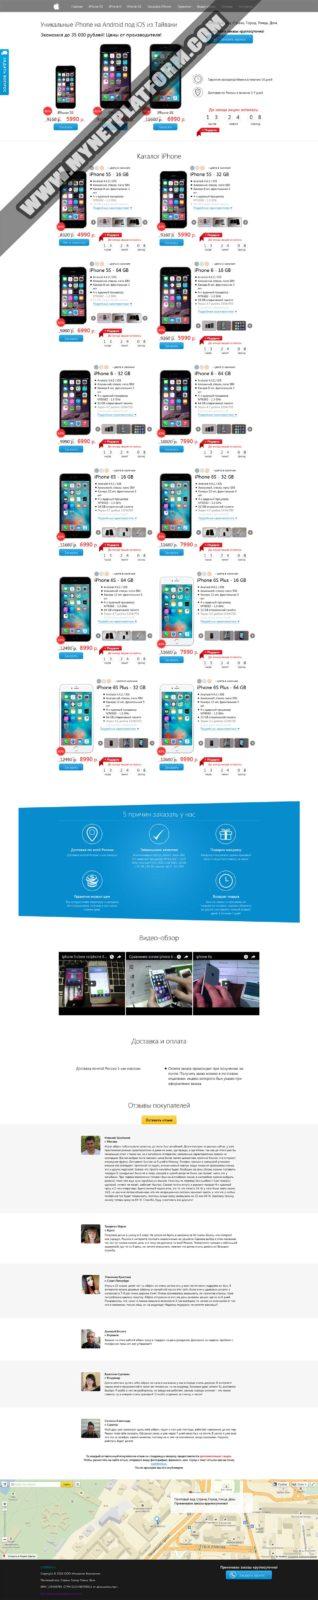 Скриншот лендинга-каталога Iphone 5s-6-6s-6s plus 001